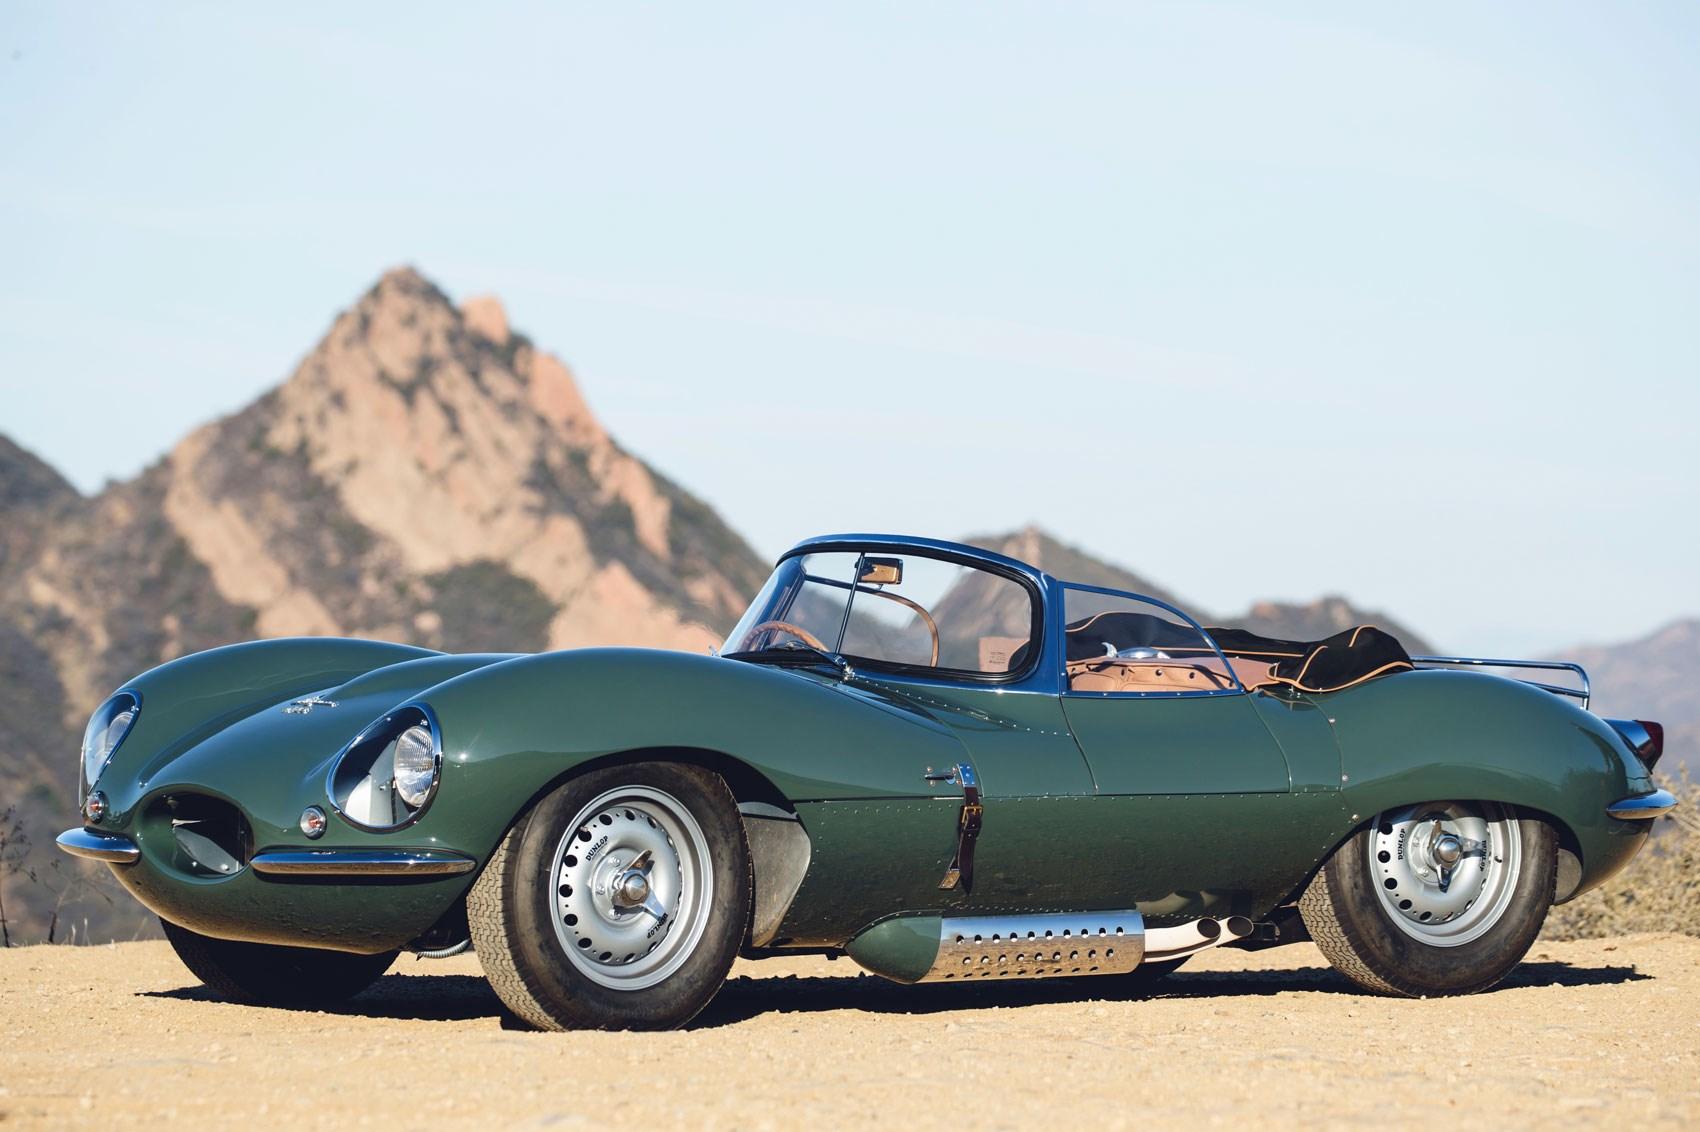 jaguar goes back to the past: nine 'new' jaguar xkss road cars to be